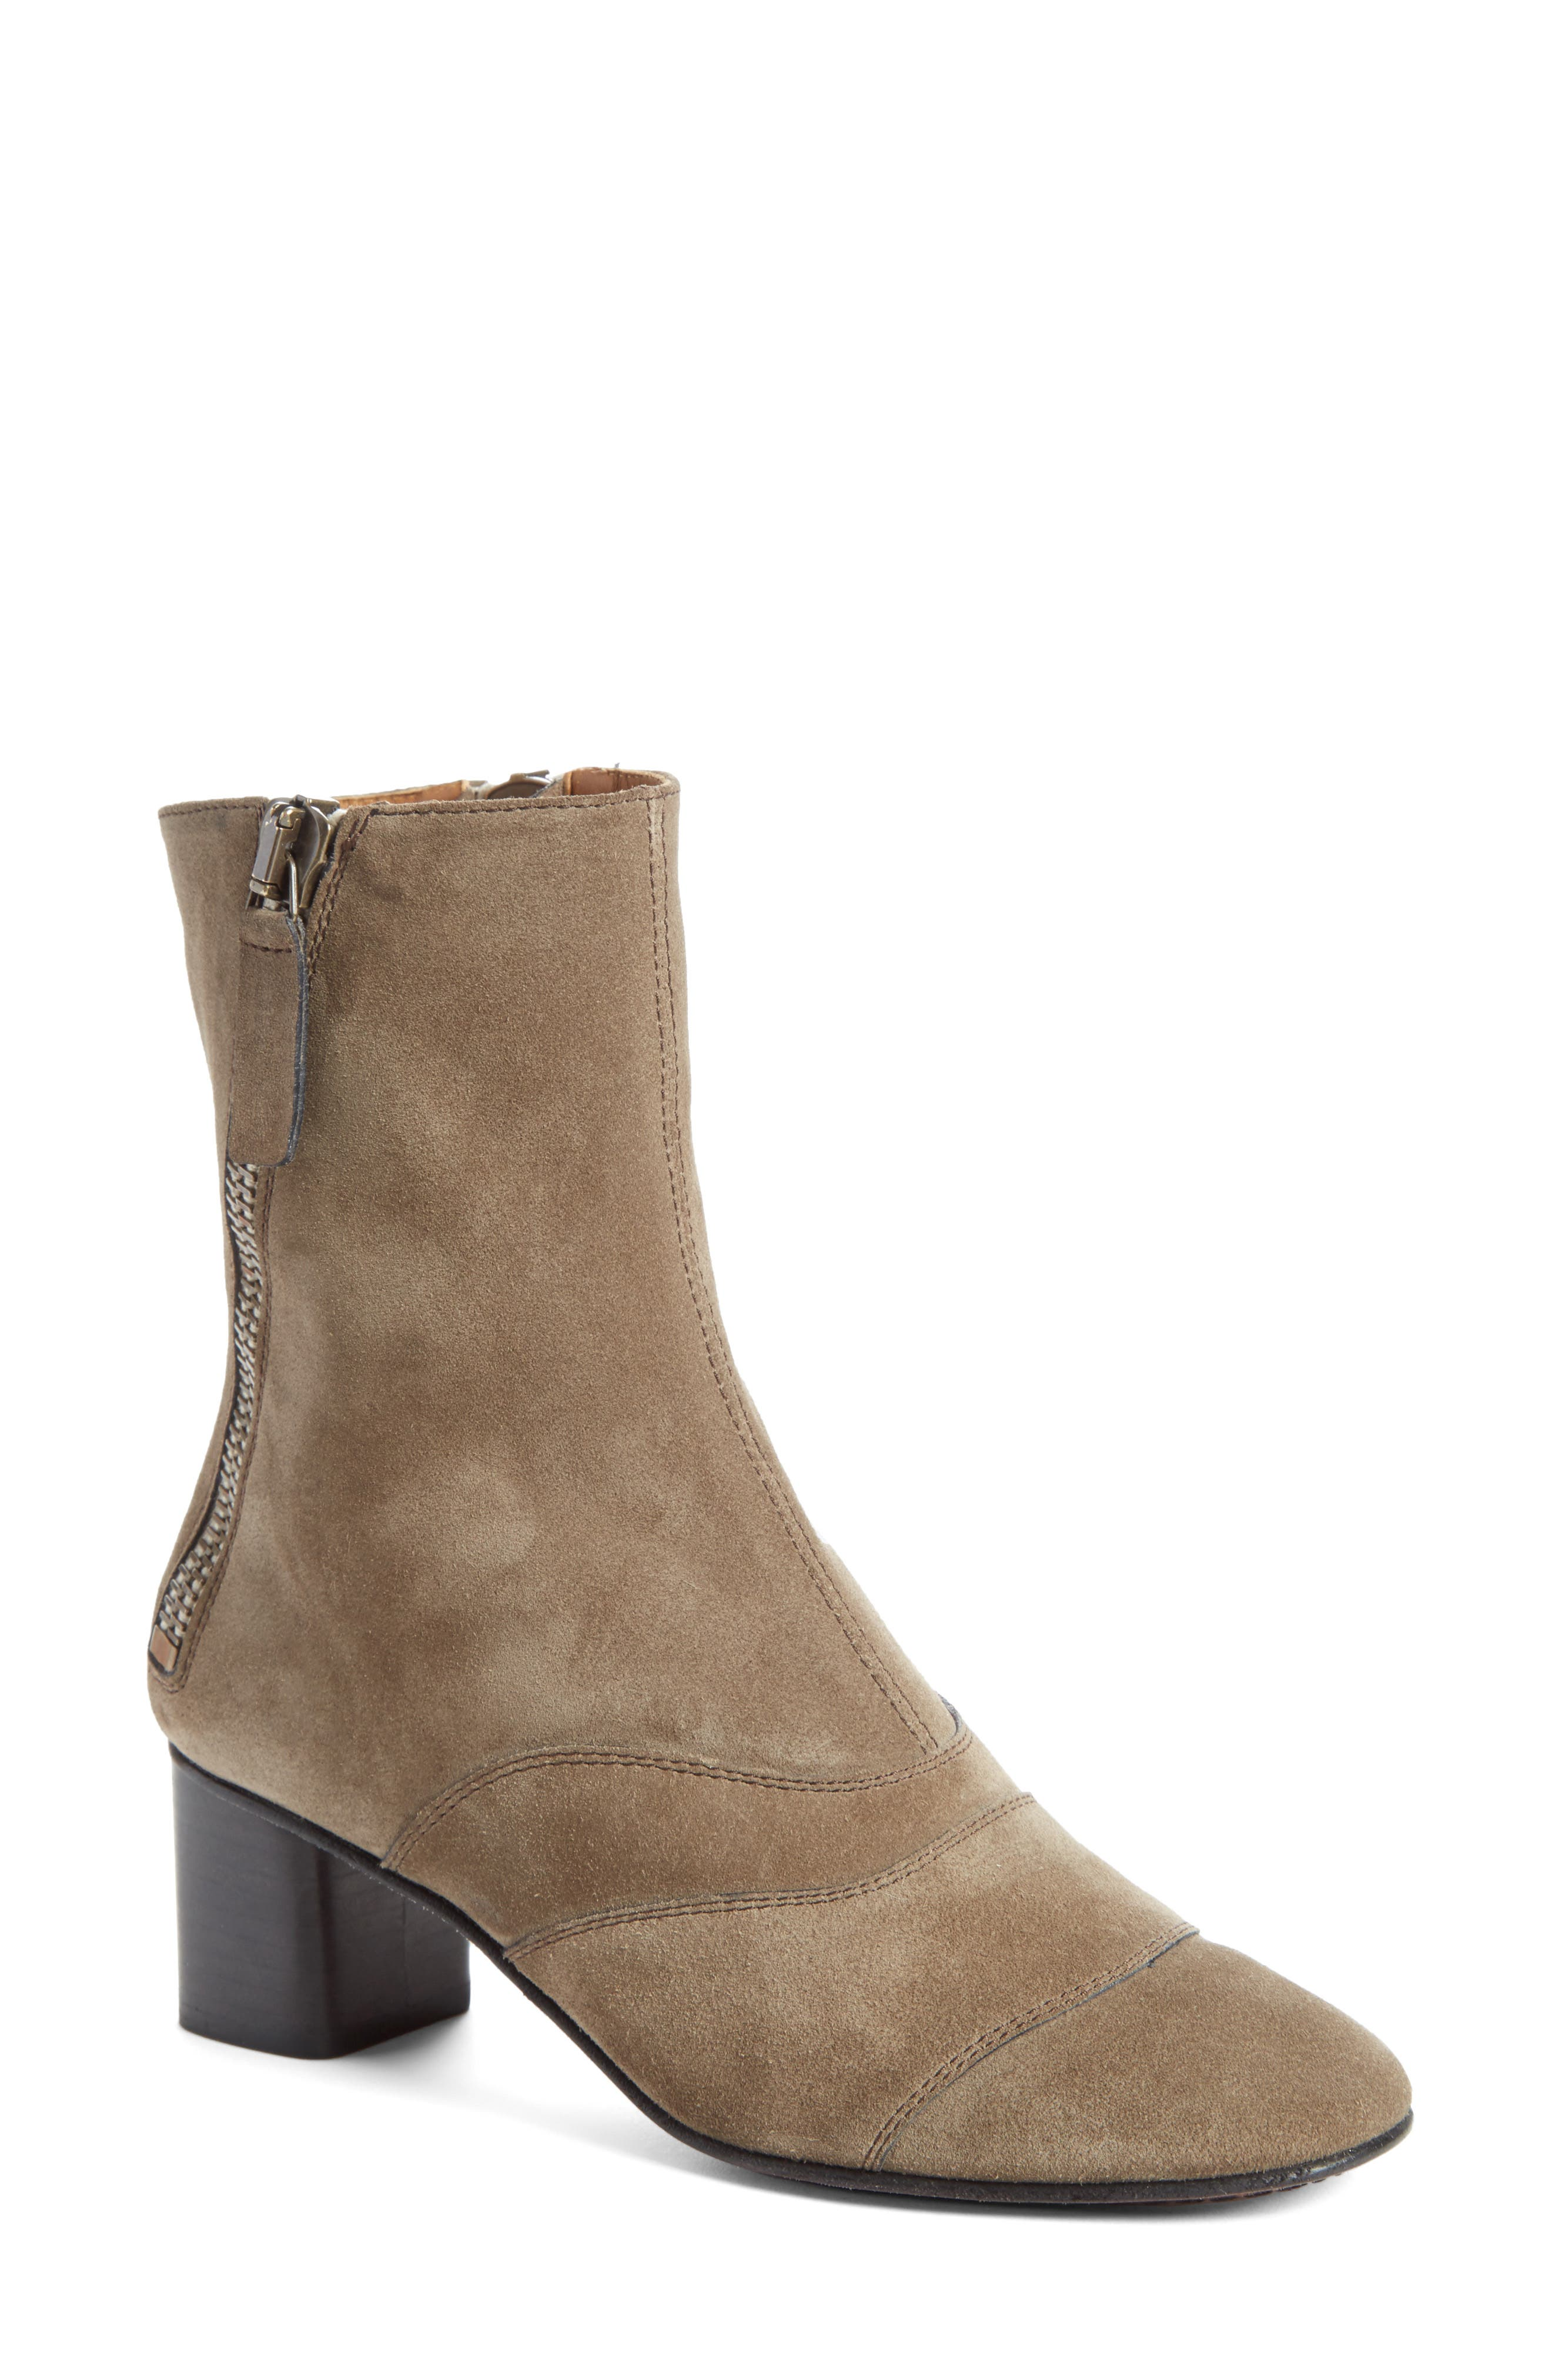 Lexie Block Heel Boot, Main, color, 021